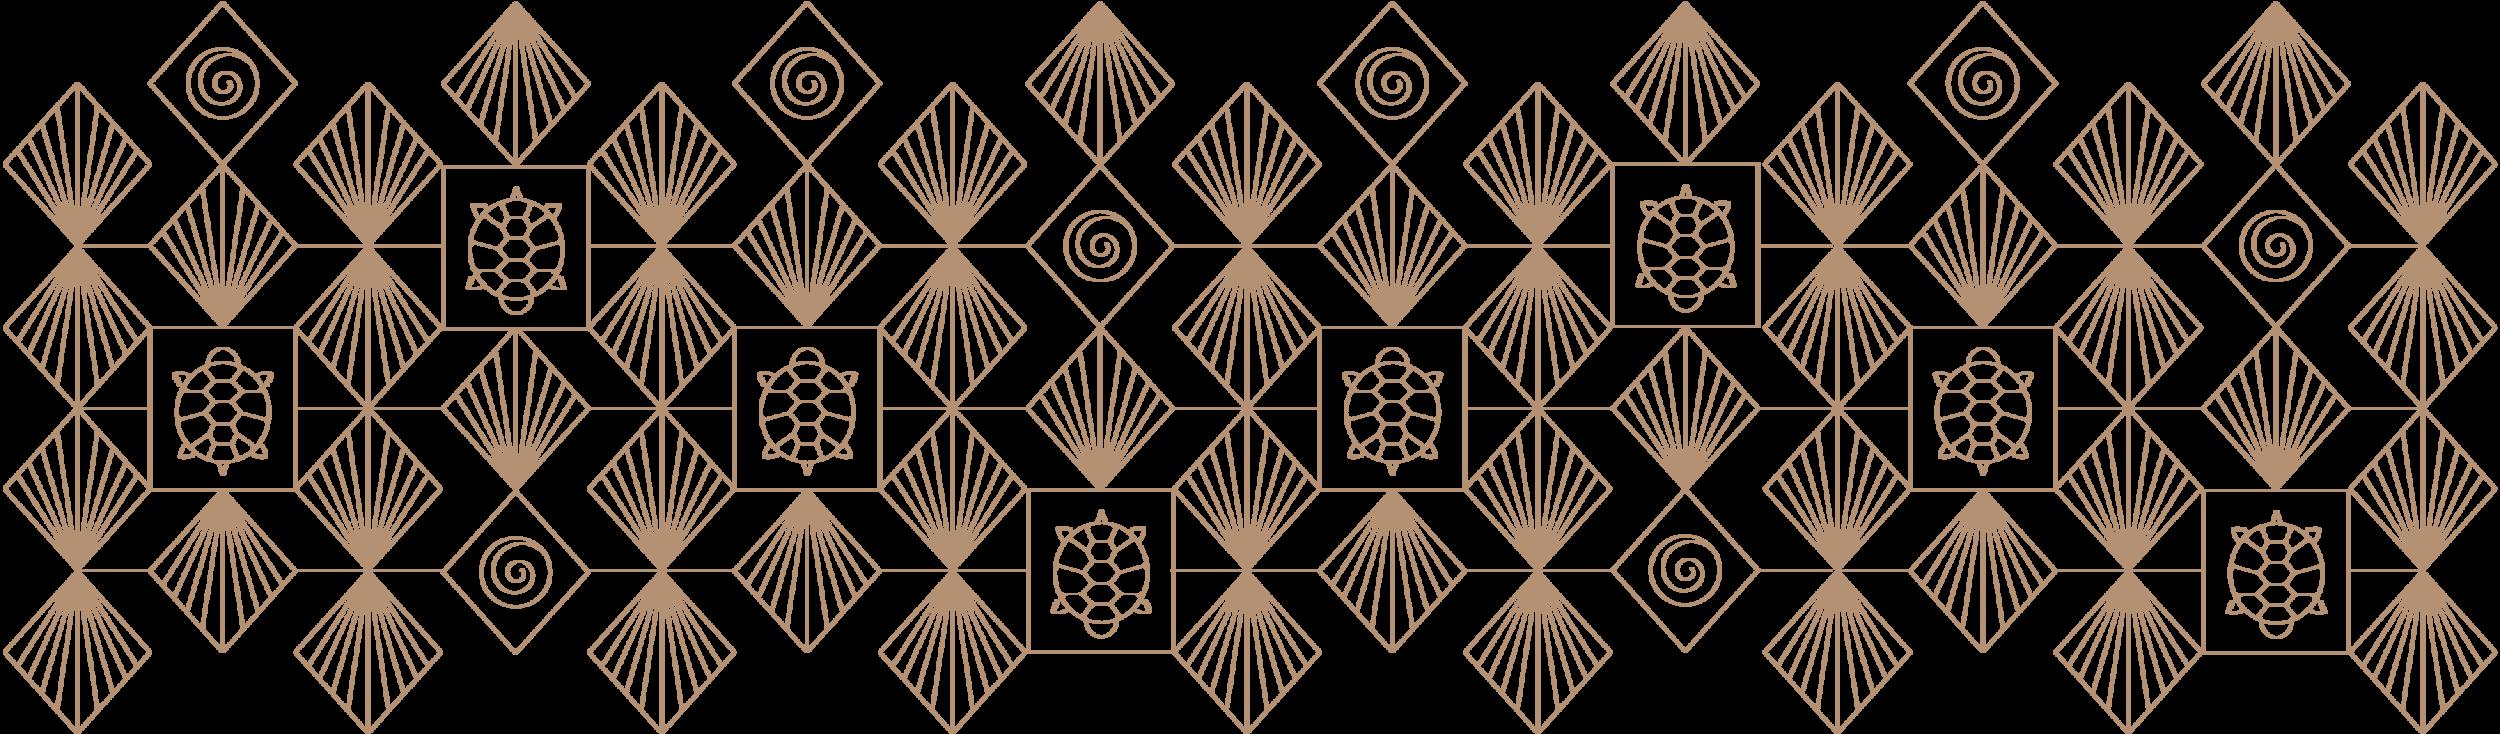 pattern-3-logo.png